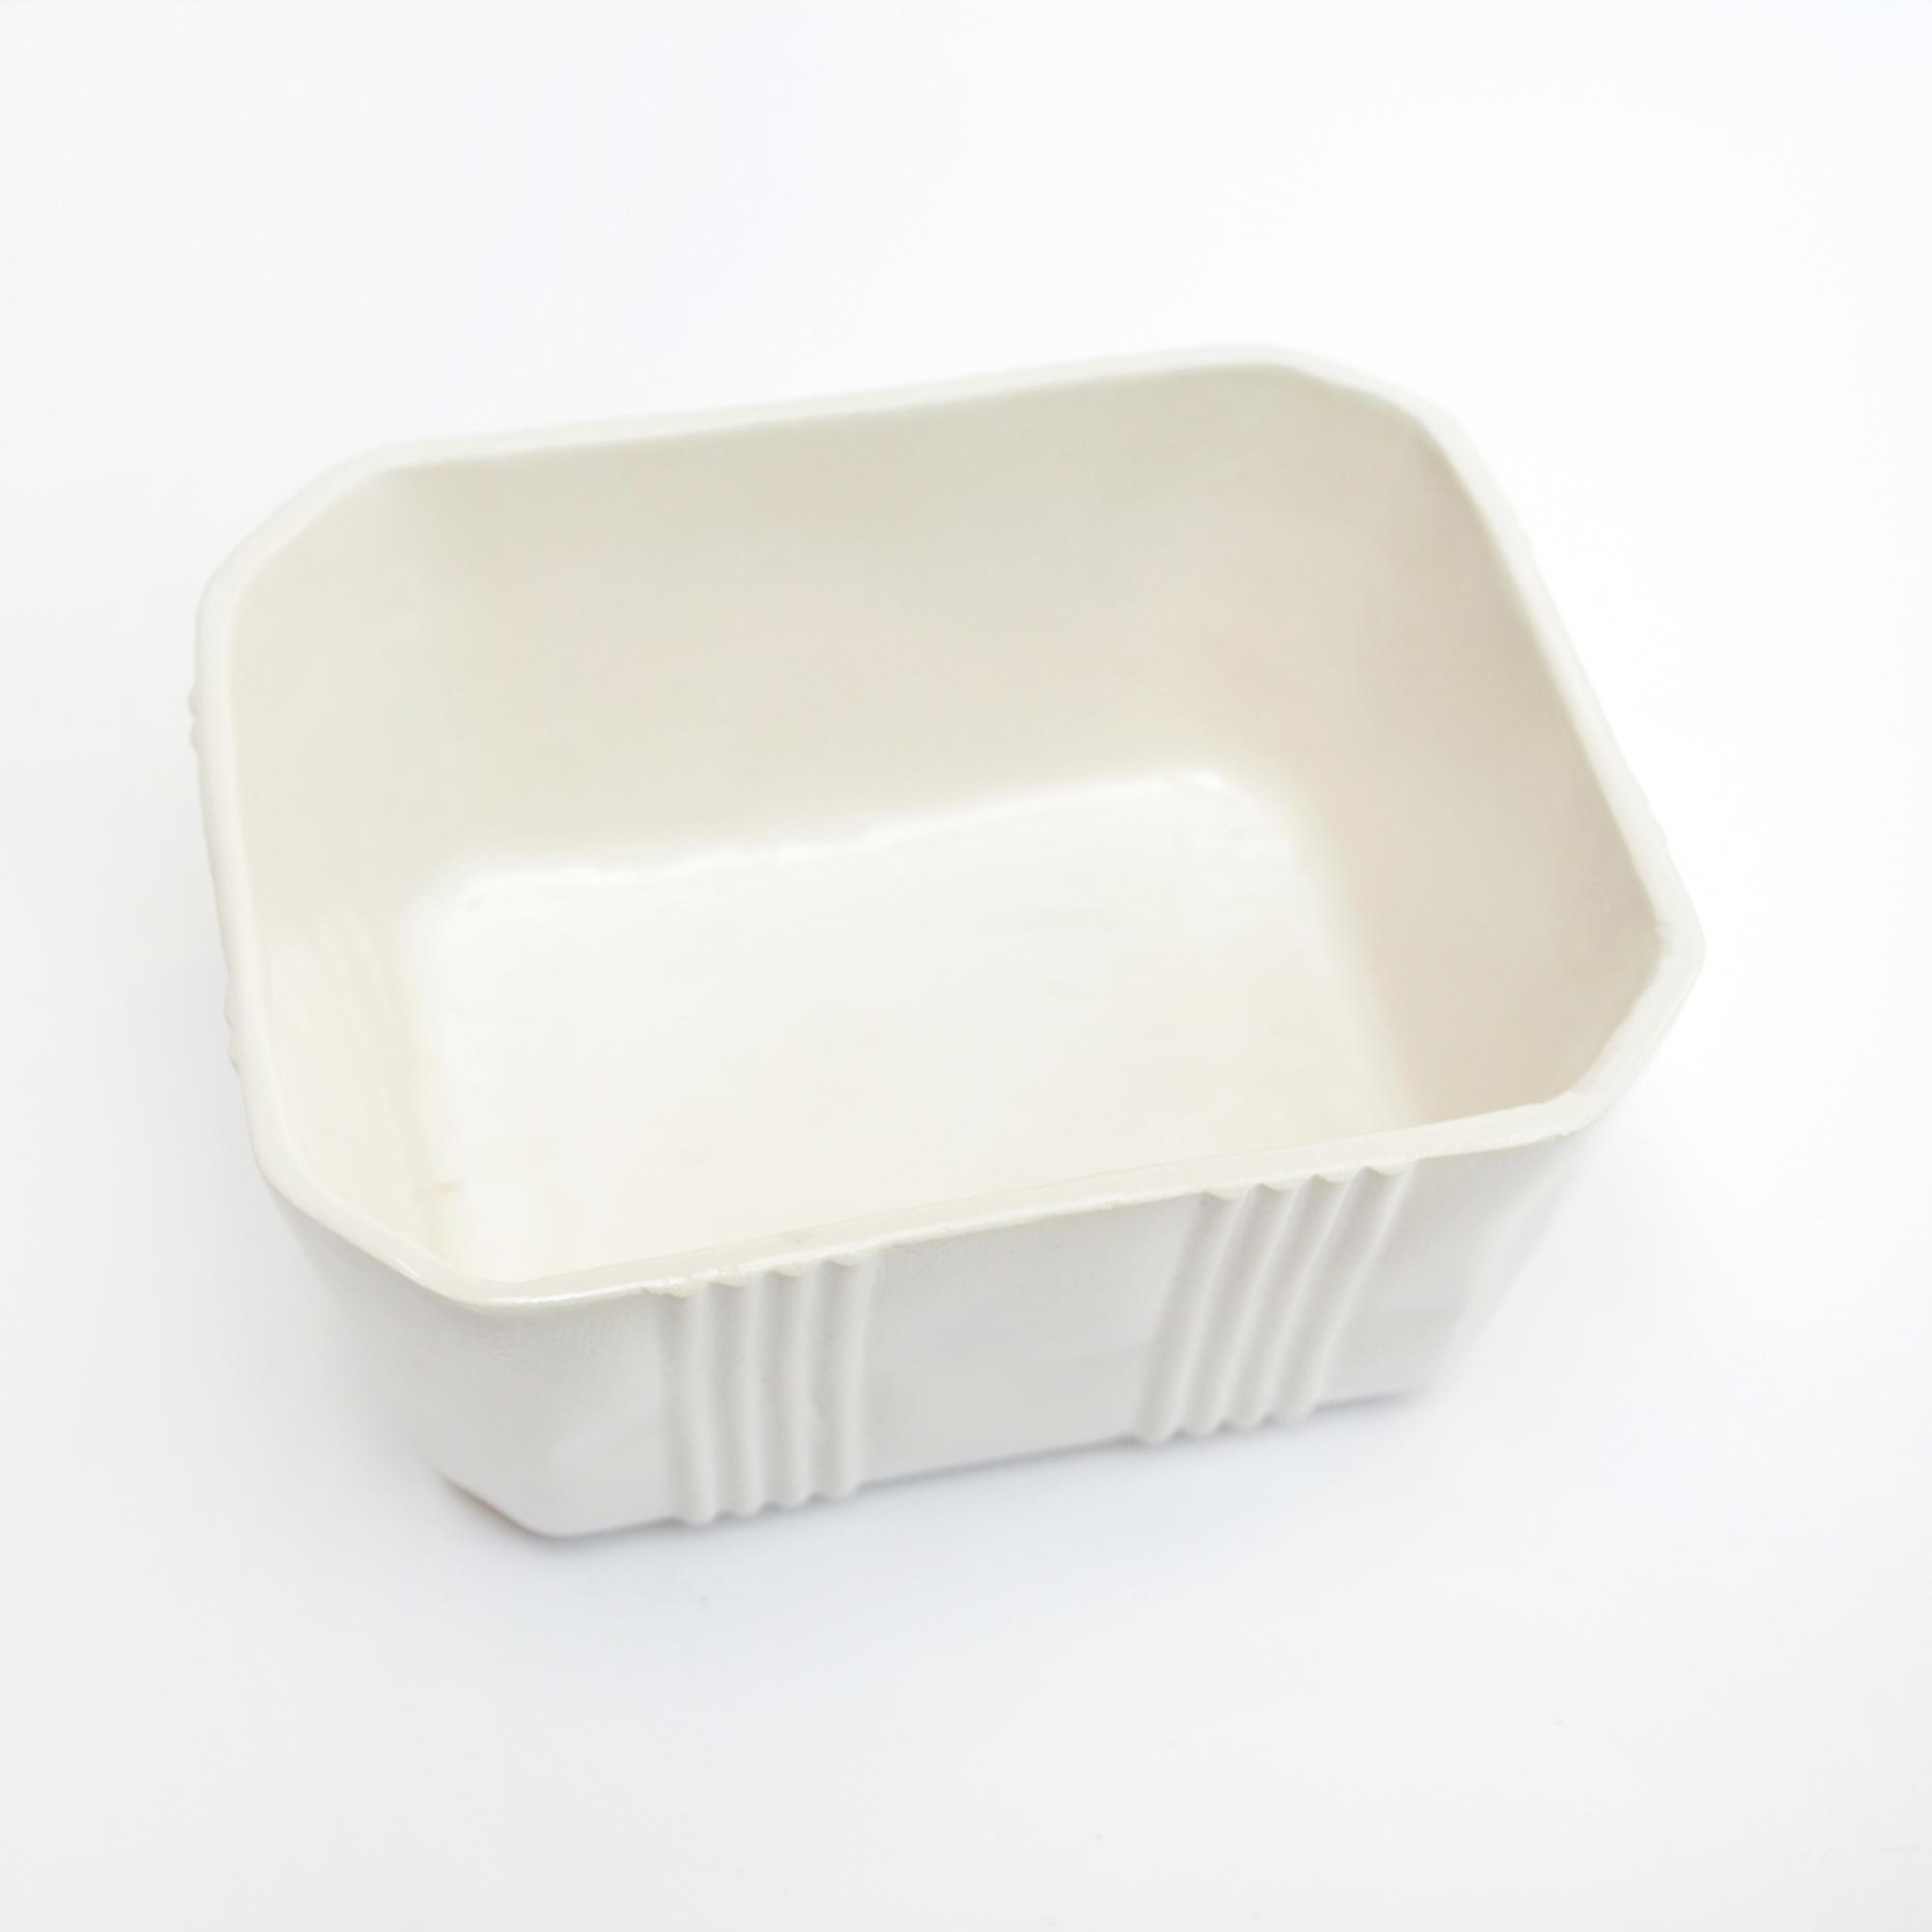 tupper contenedor ceramico blanco loza